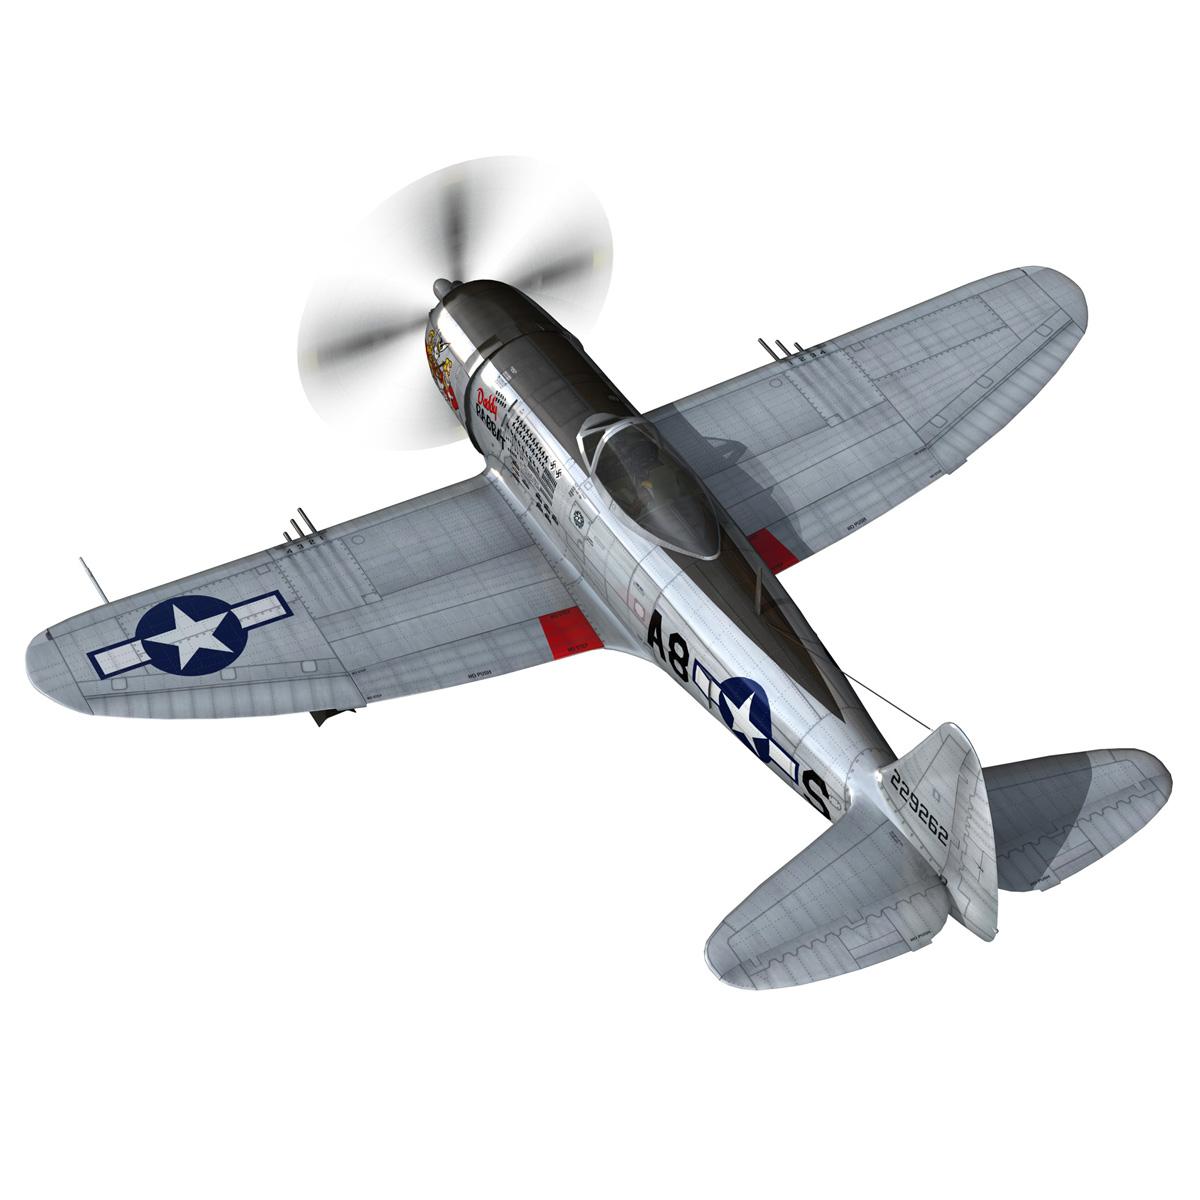 republic p-47 thunderbolt – daddy rabbit 3d model fbx c4d lwo obj 272693